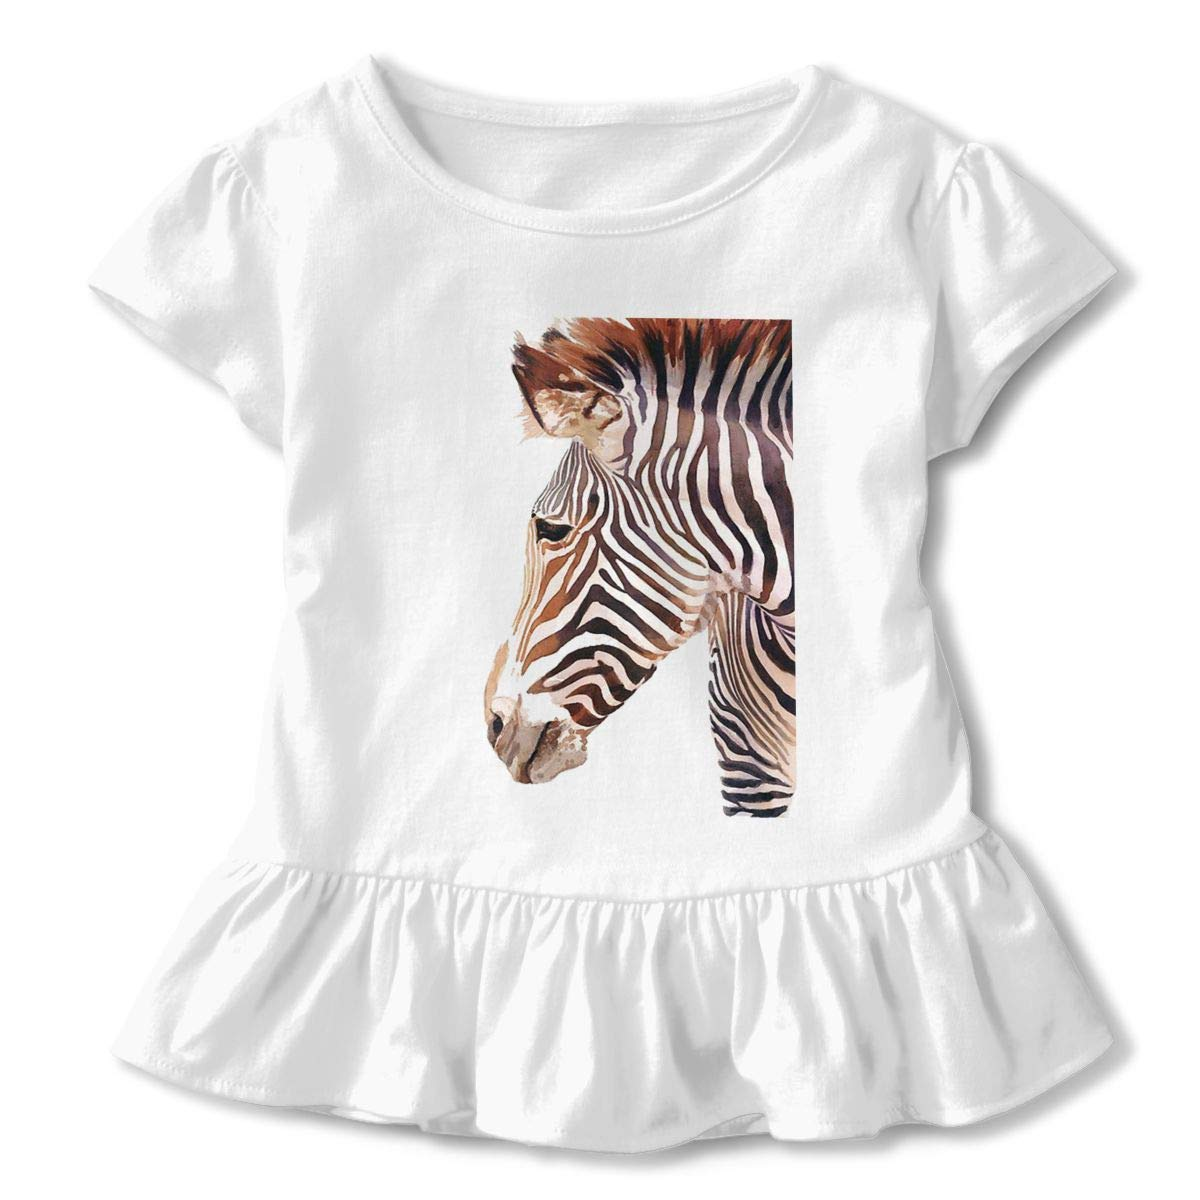 Happy-girl Ye Zebra Outdoor Lover Short-Sleeve Tunic T-Shirt